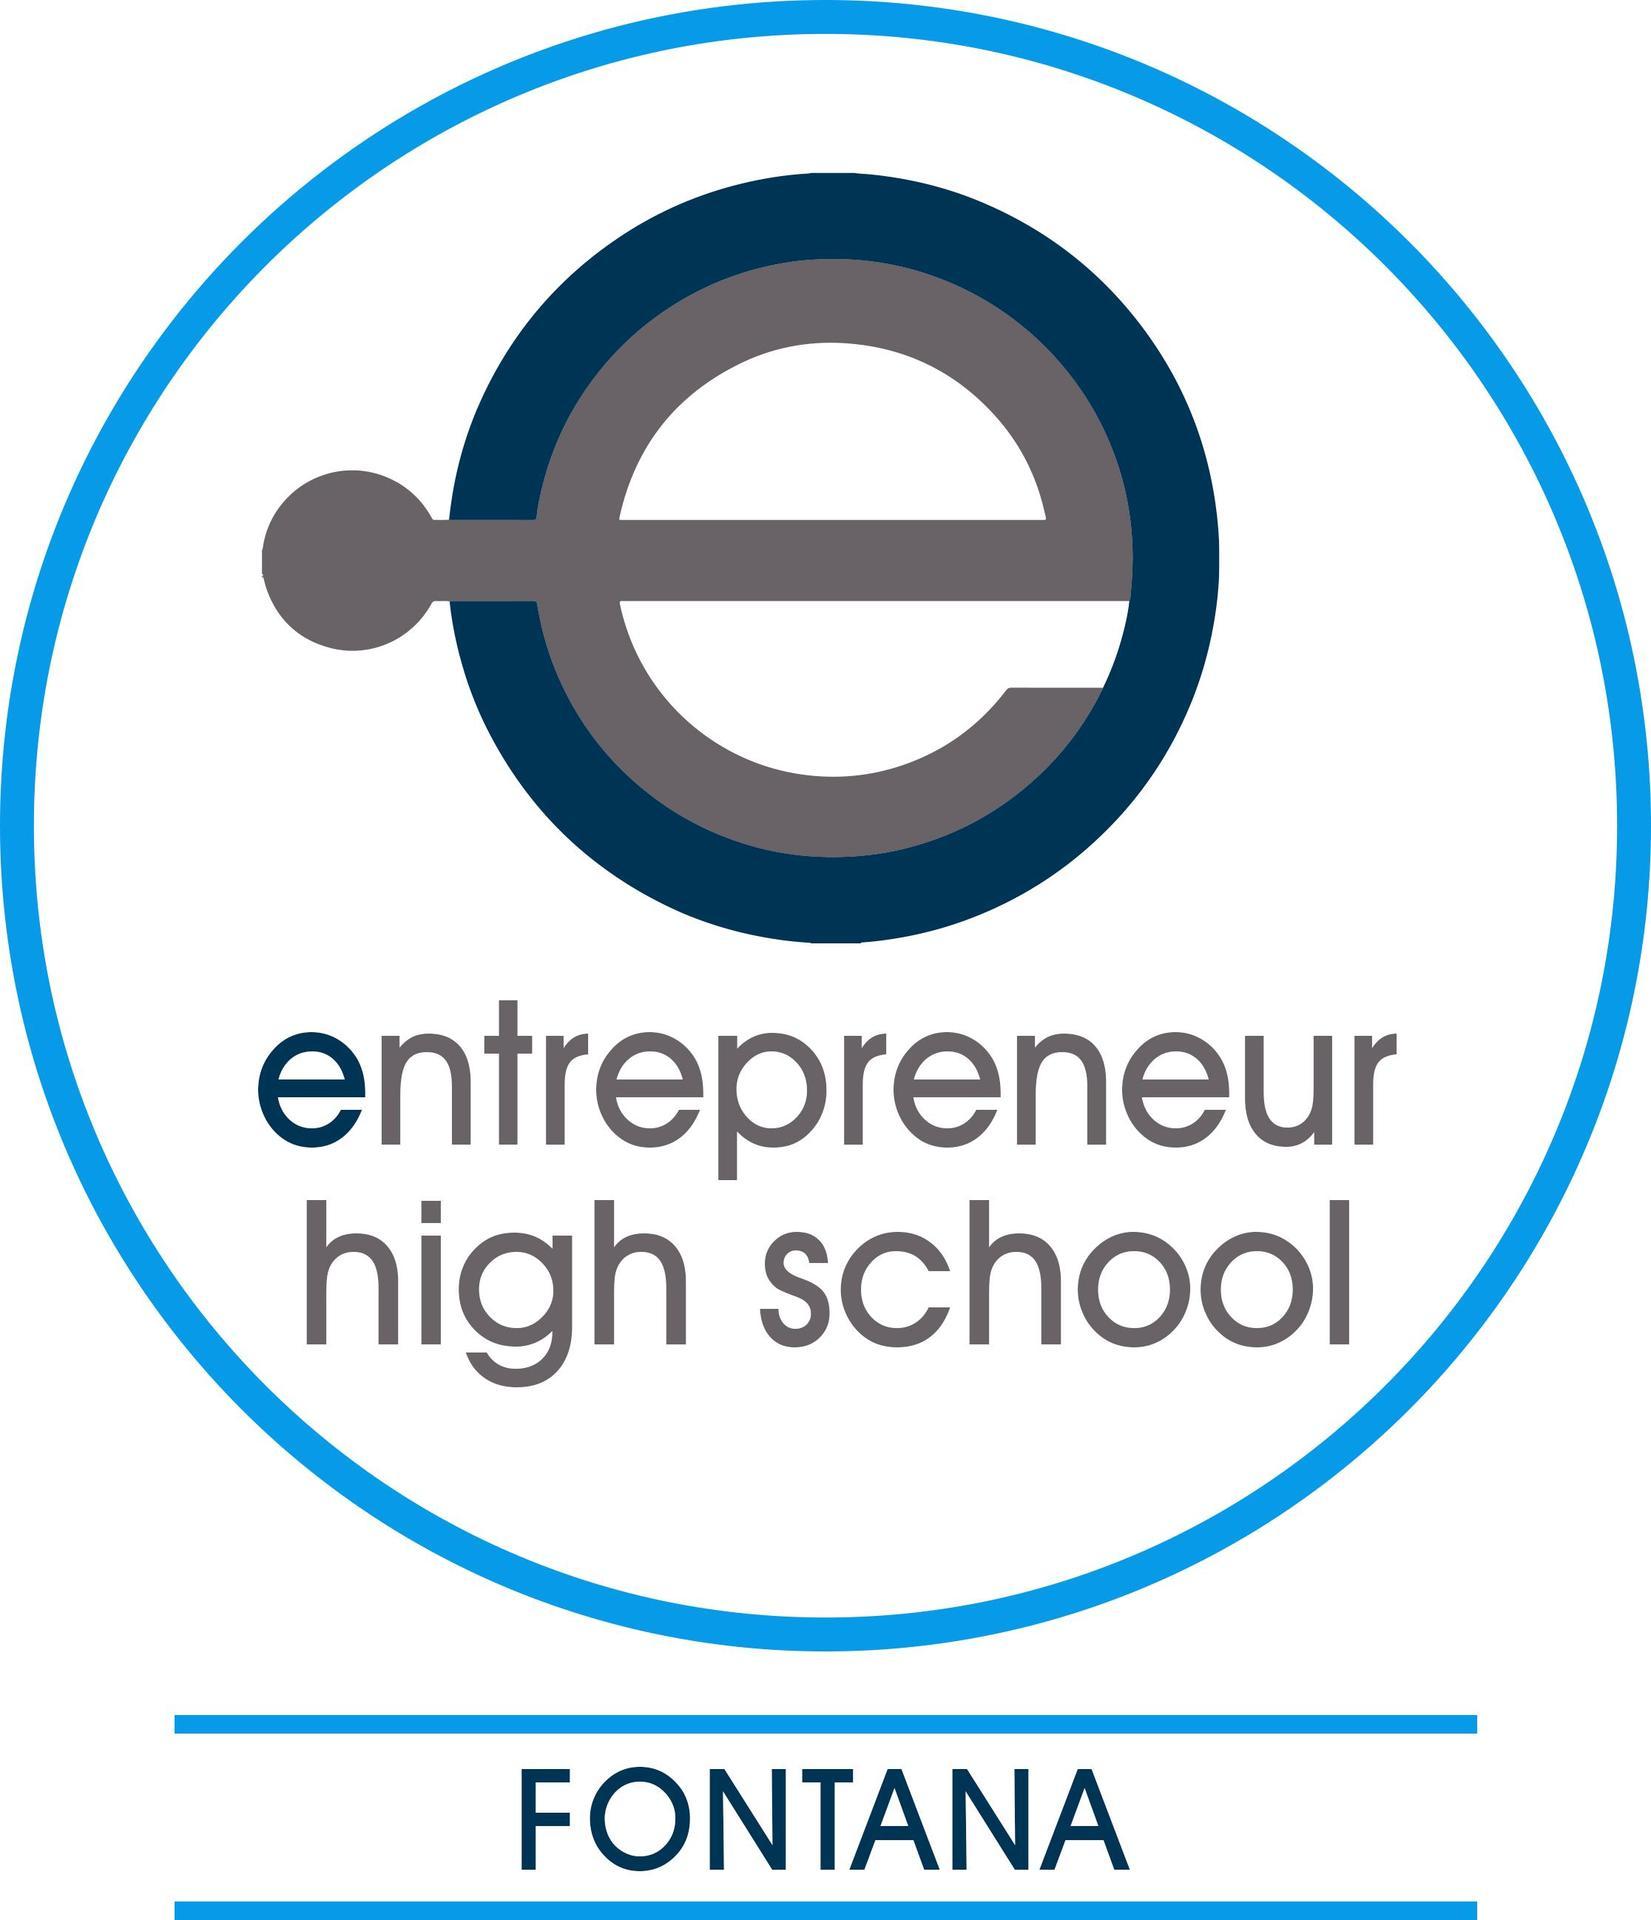 Entrepreneur High School Fontana